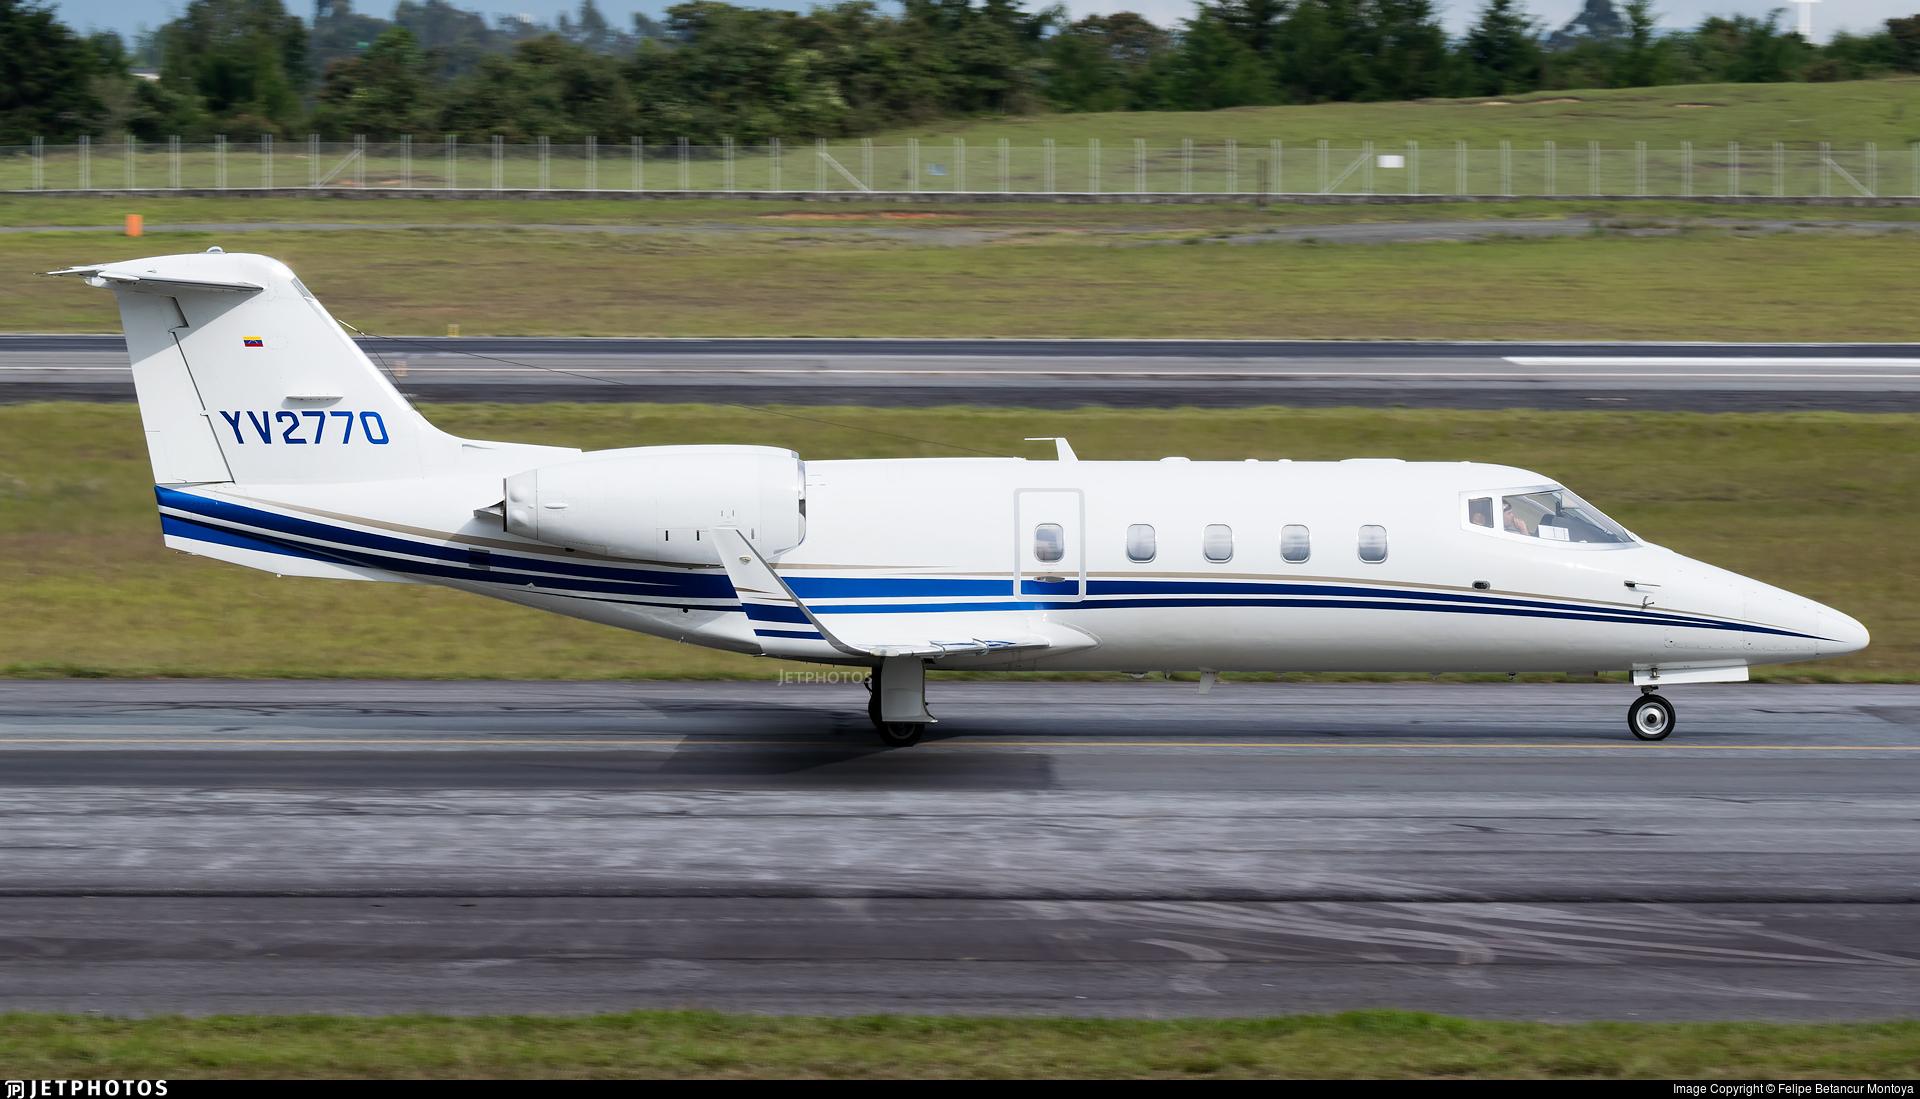 YV2770 - Bombardier Learjet 55B - Private